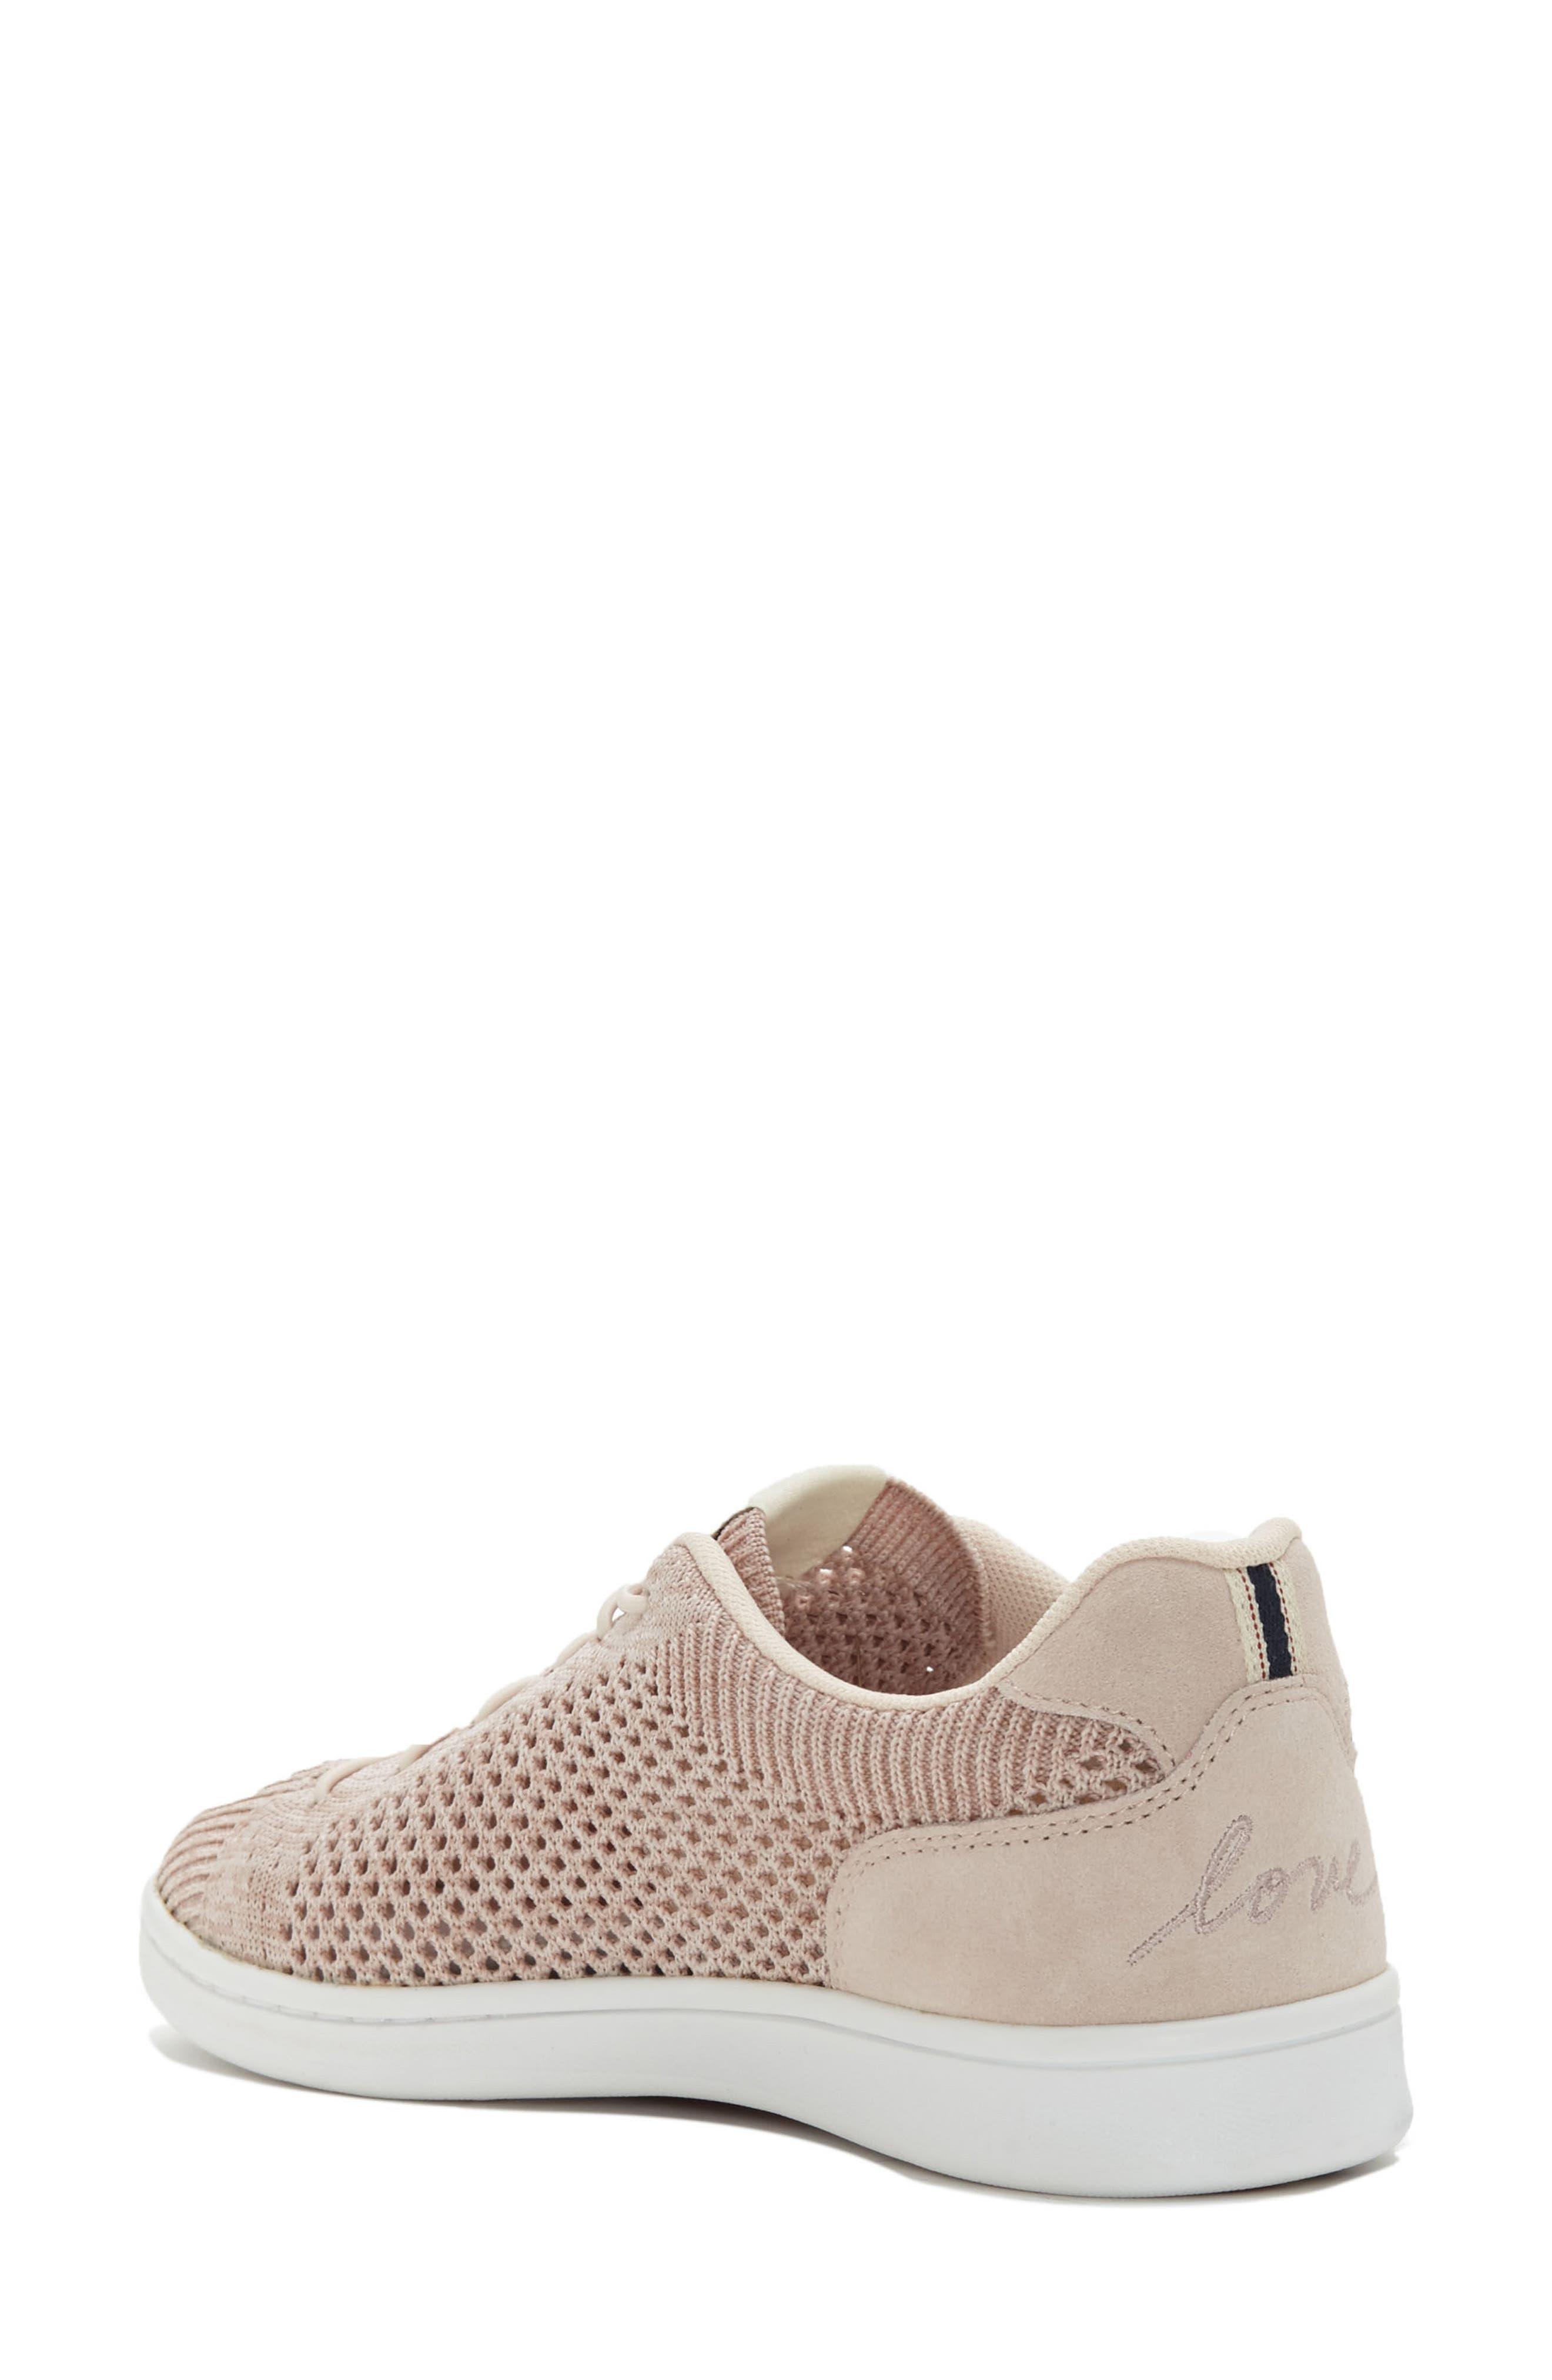 Alternate Image 2  - ED Ellen DeGeneres Casie Knit Sneaker (Women)